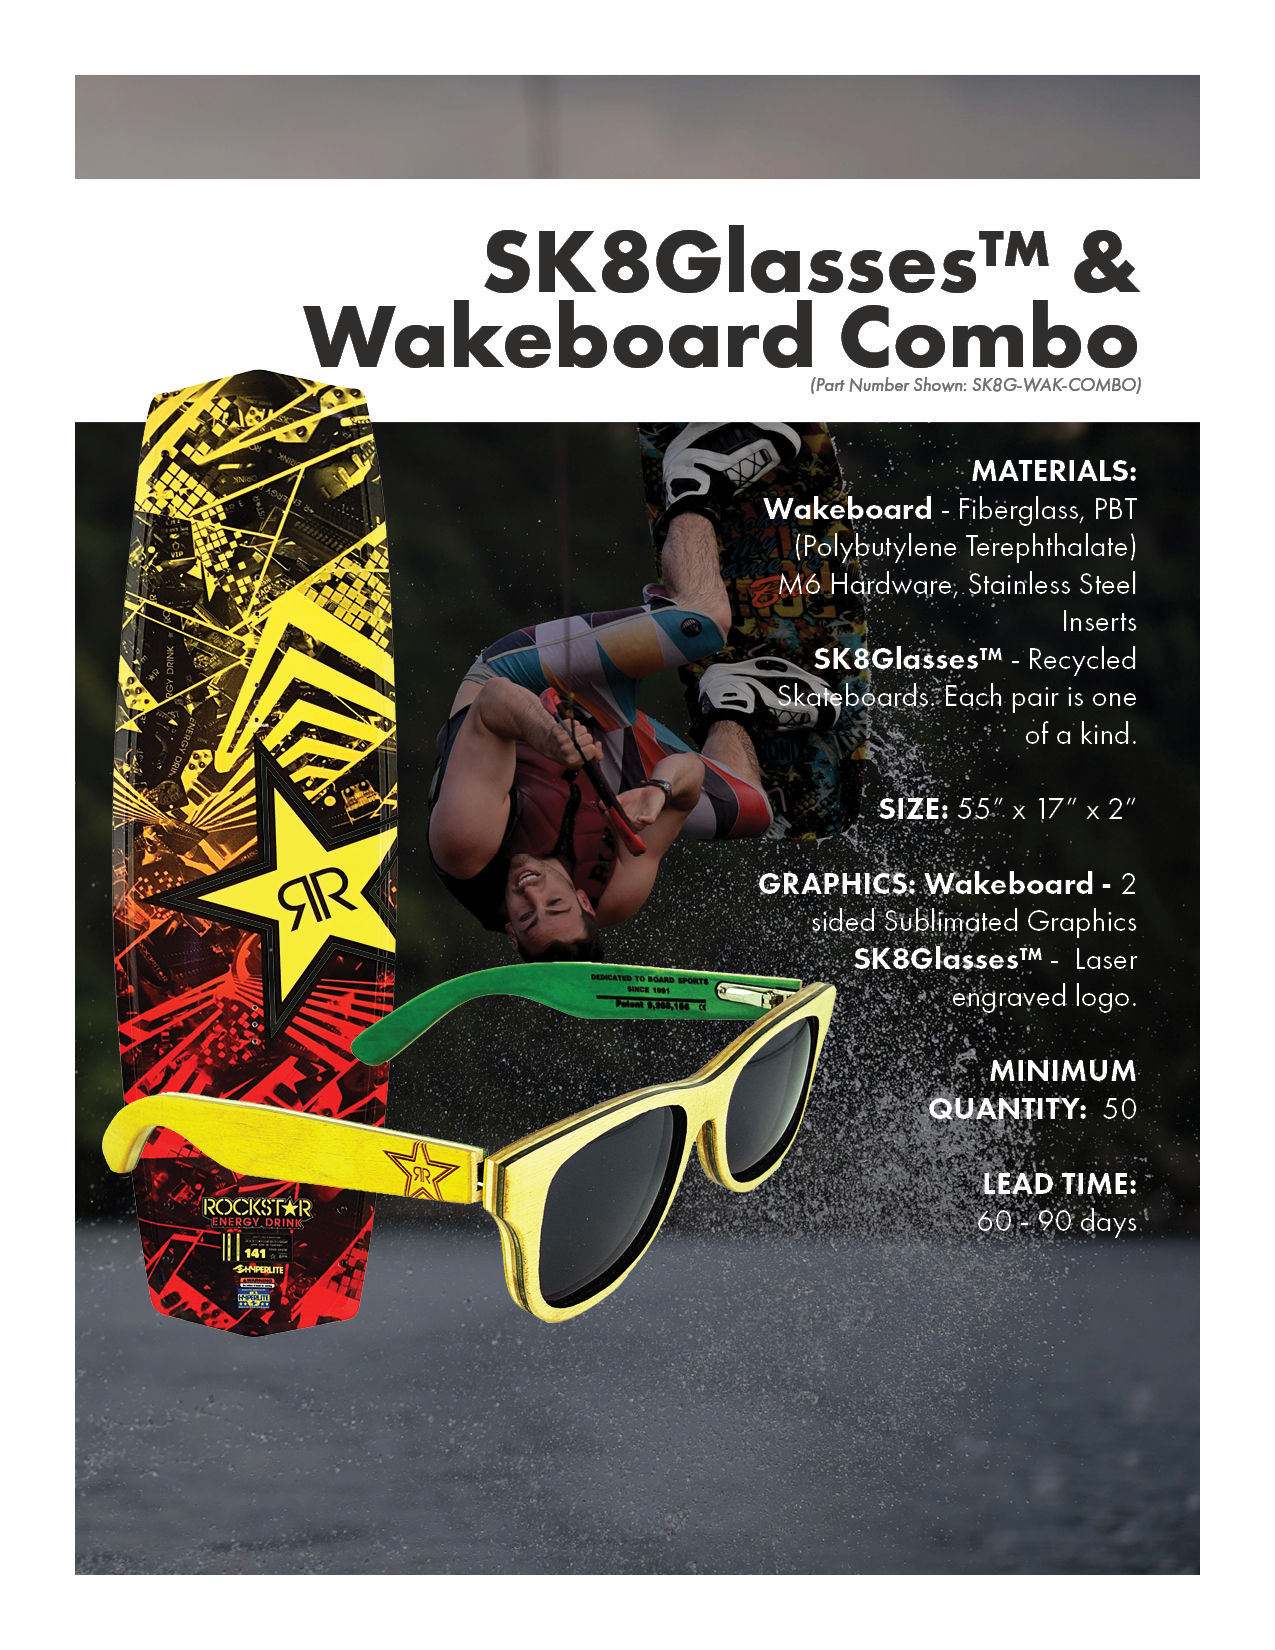 SK8Glasses & Wakeboard Combo